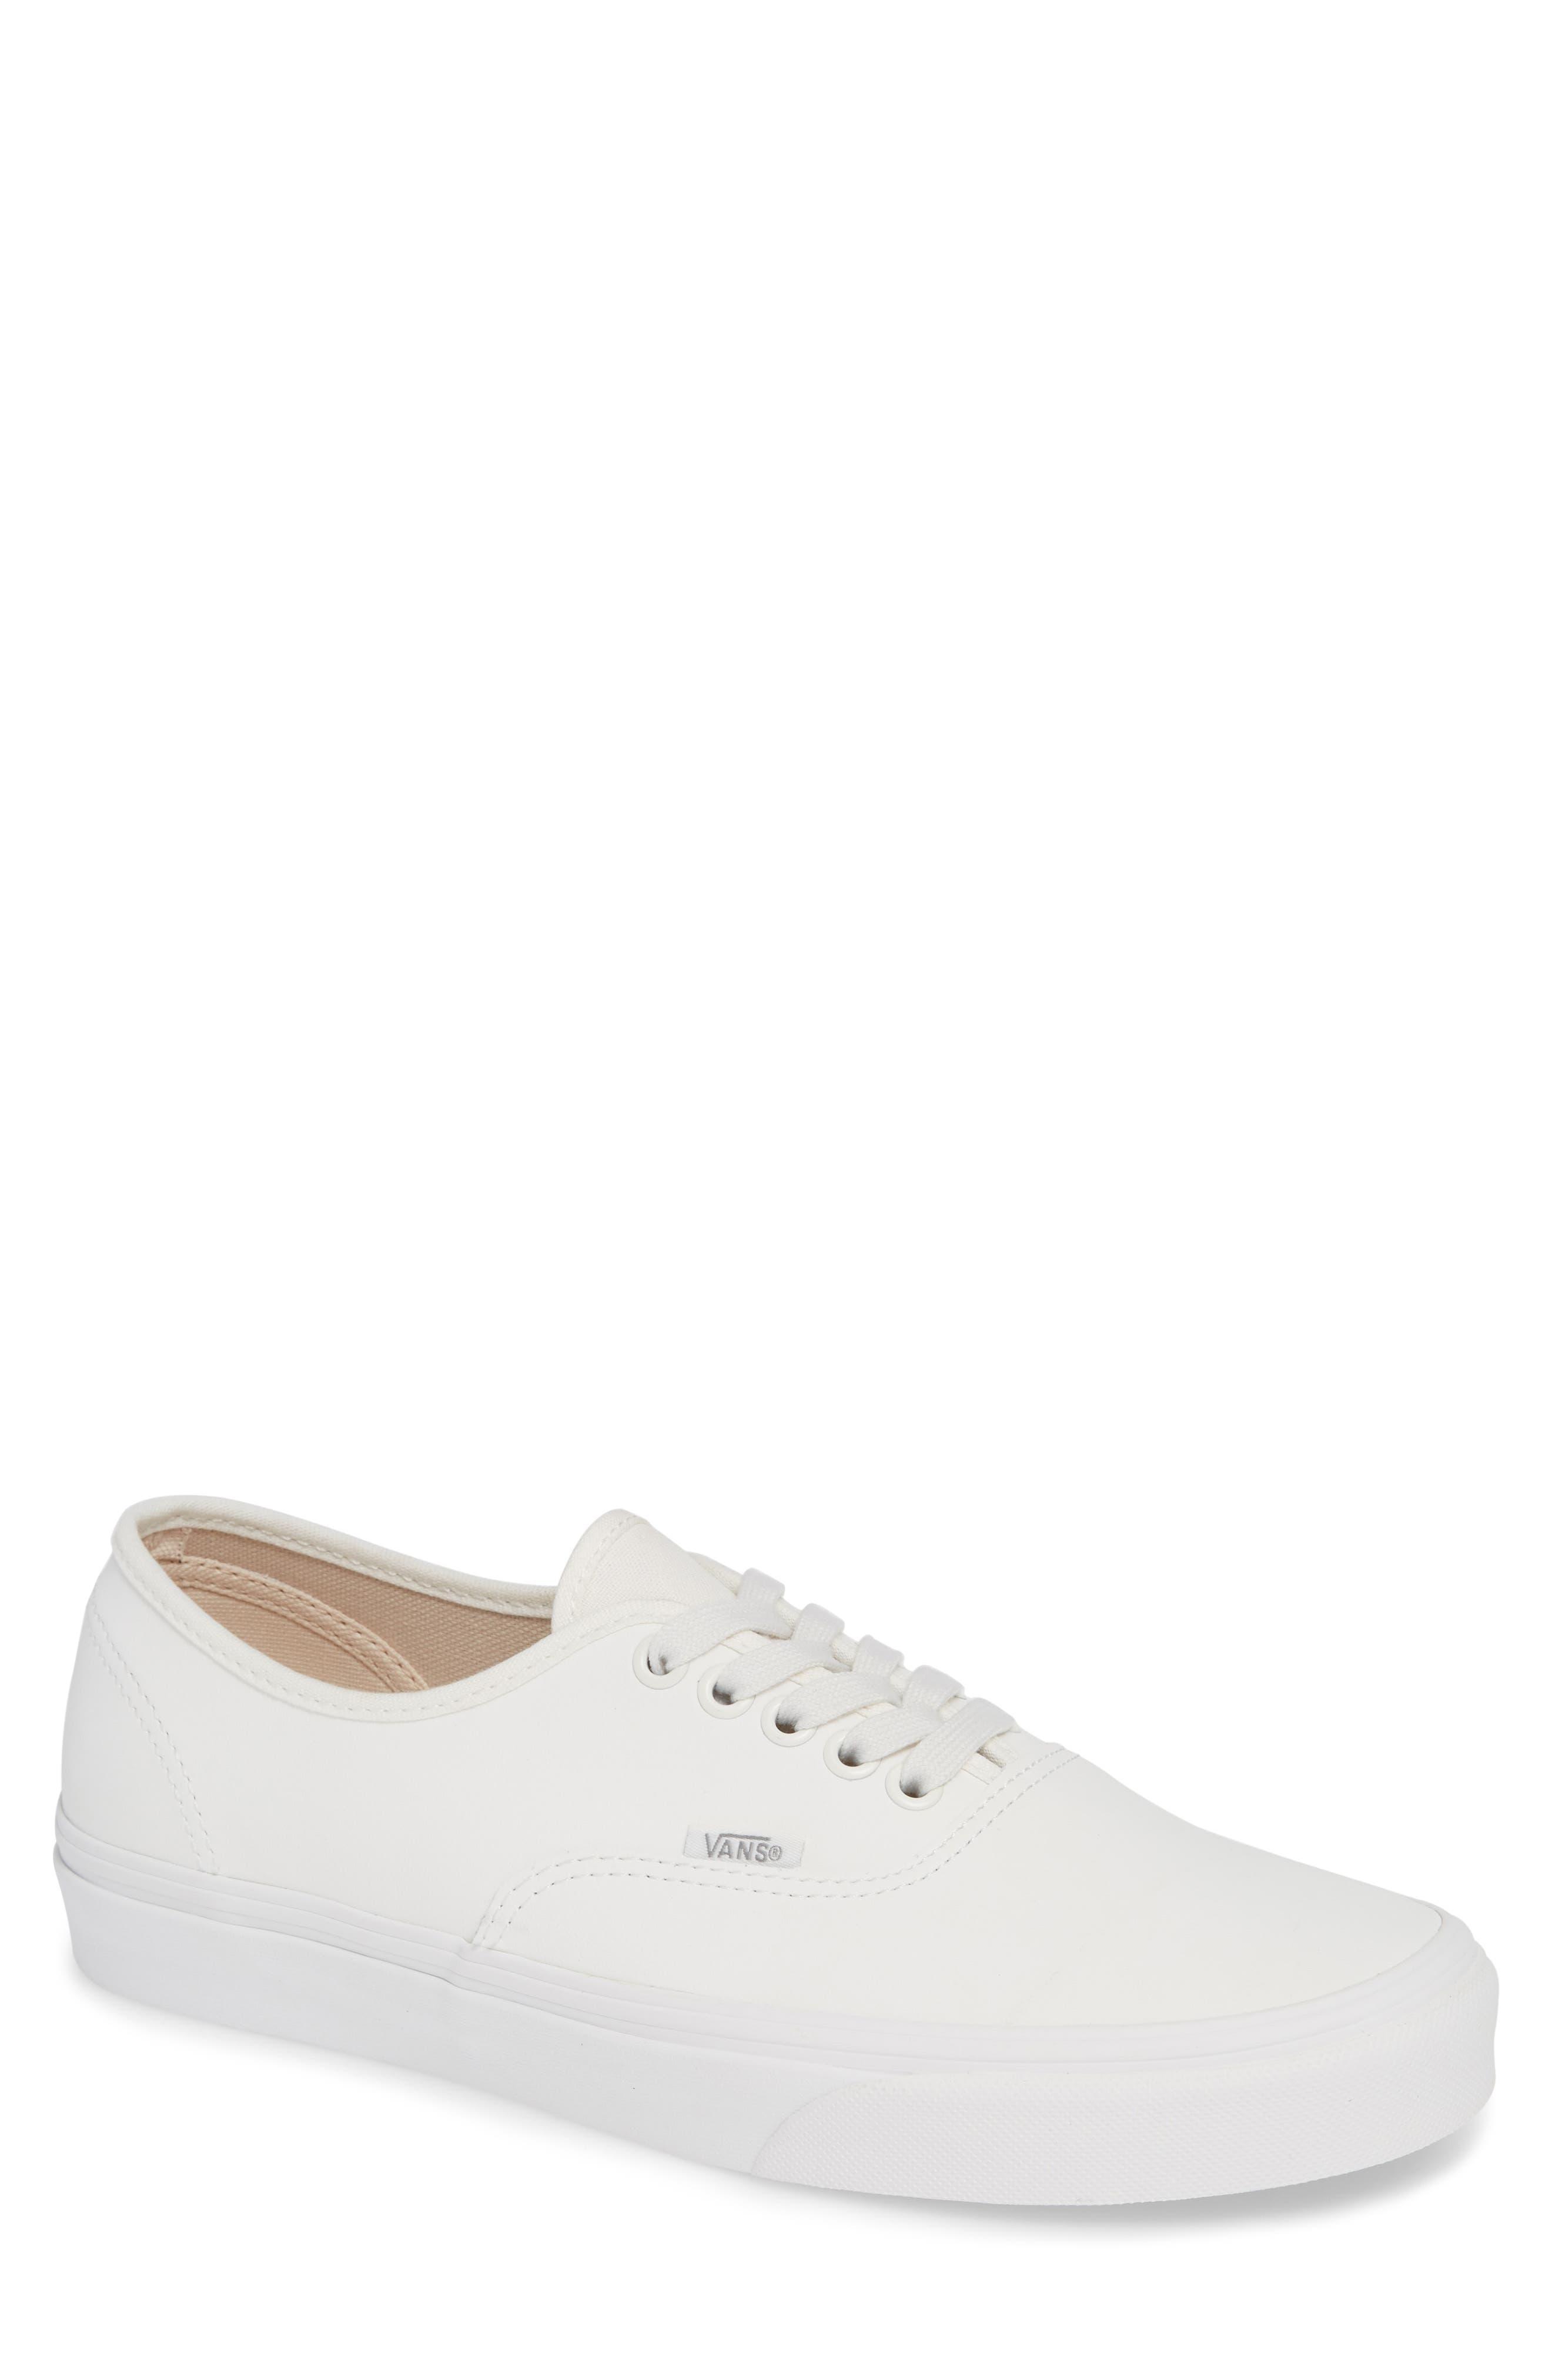 Authentic Buck Sneaker,                             Main thumbnail 1, color,                             WHITE